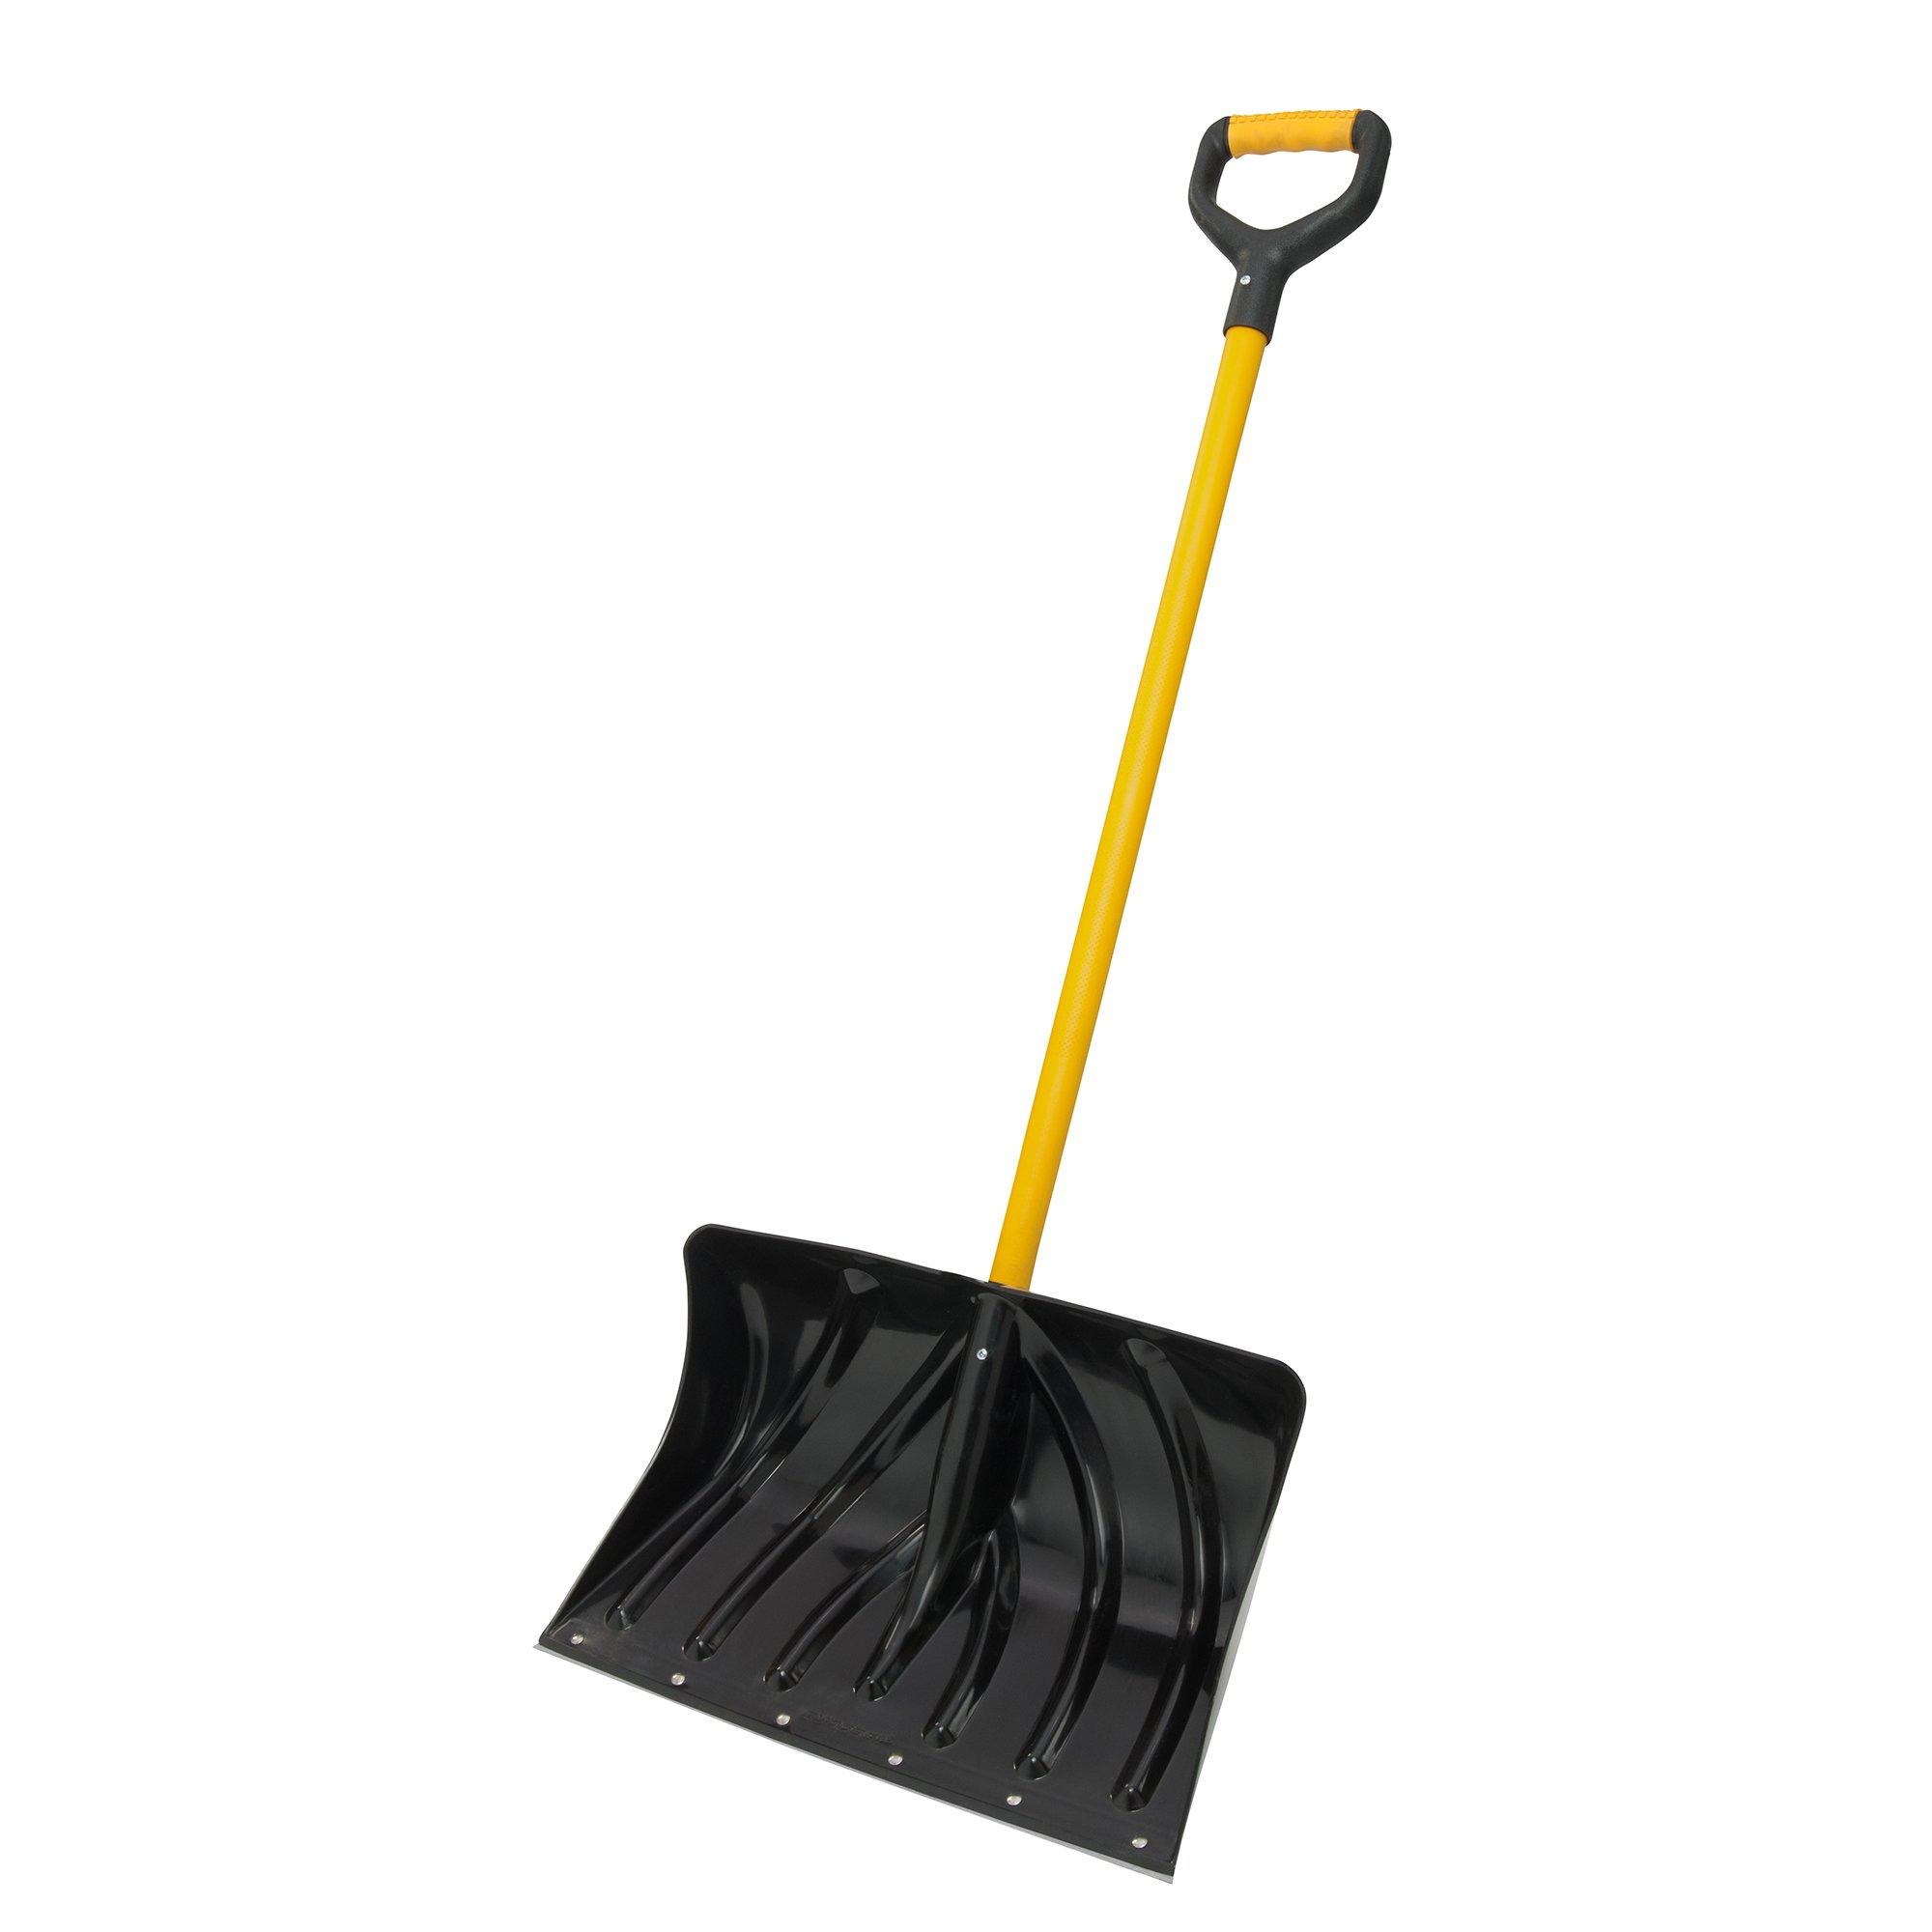 Suncast SCF2950 20-Inch Snow Shovel/Pusher Combo with Fiberglass D-Grip Handle And Wear Strip by Suncast